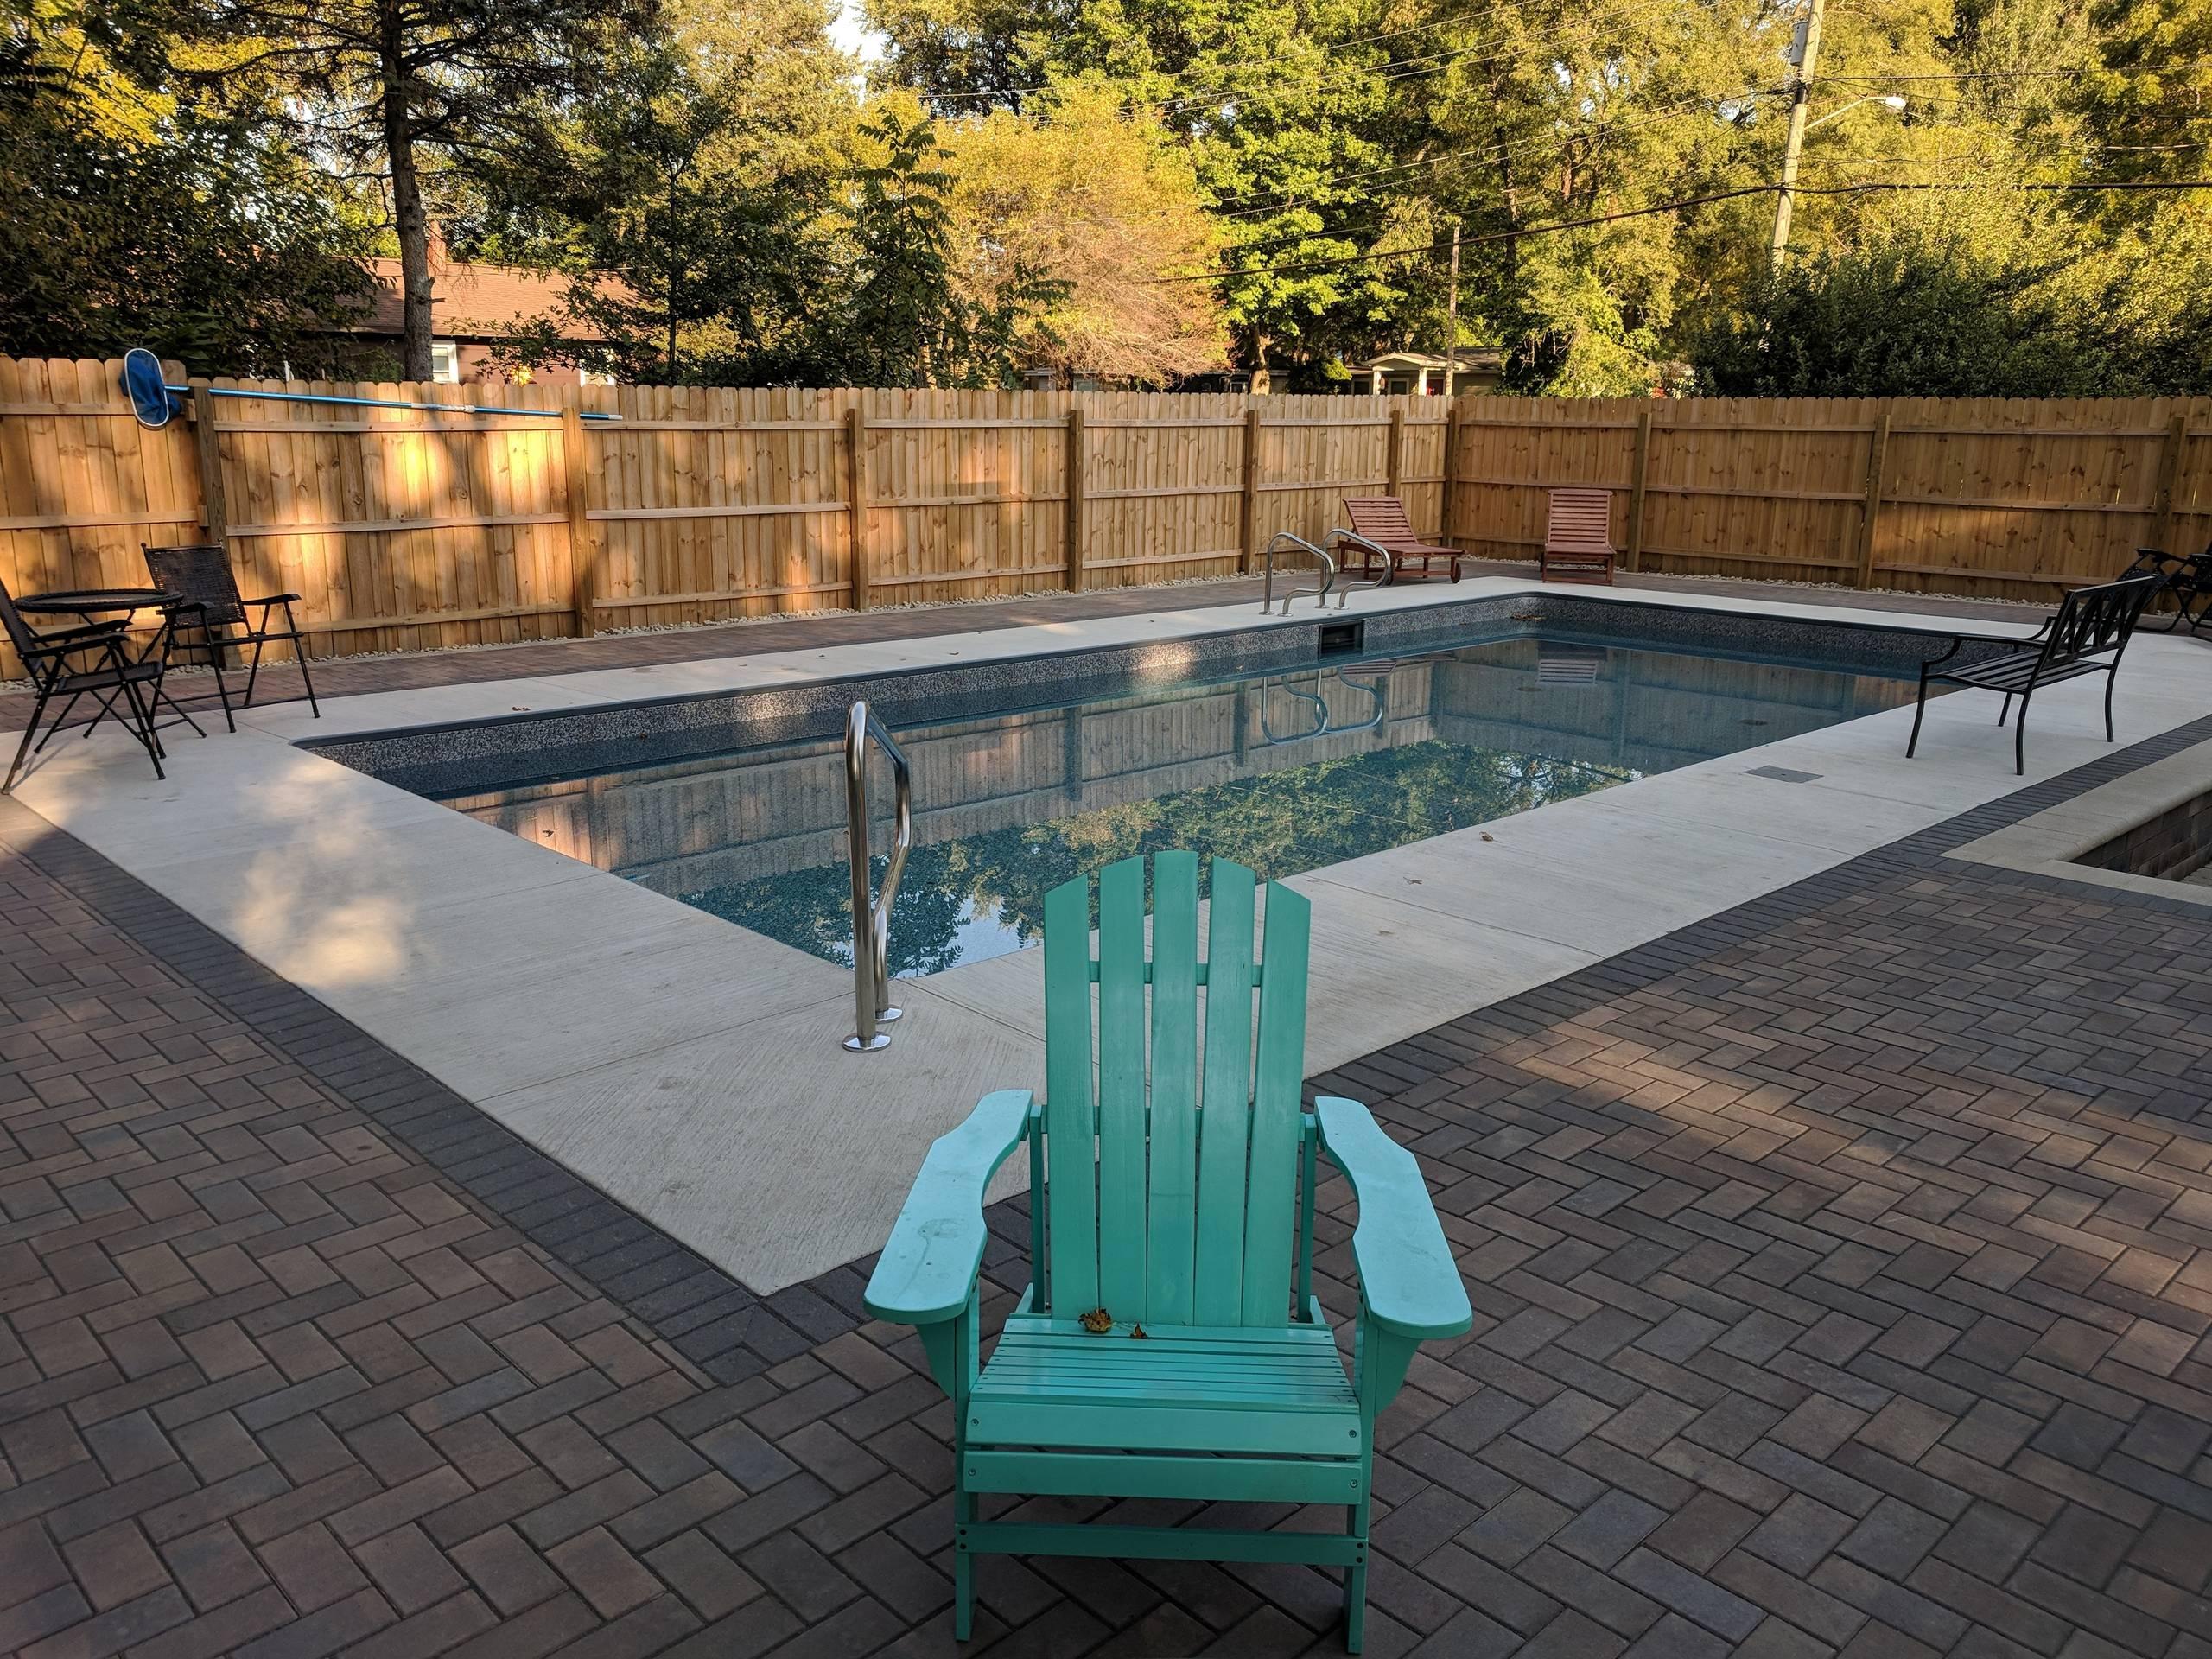 New Buffalo Pool Surround & Landscape